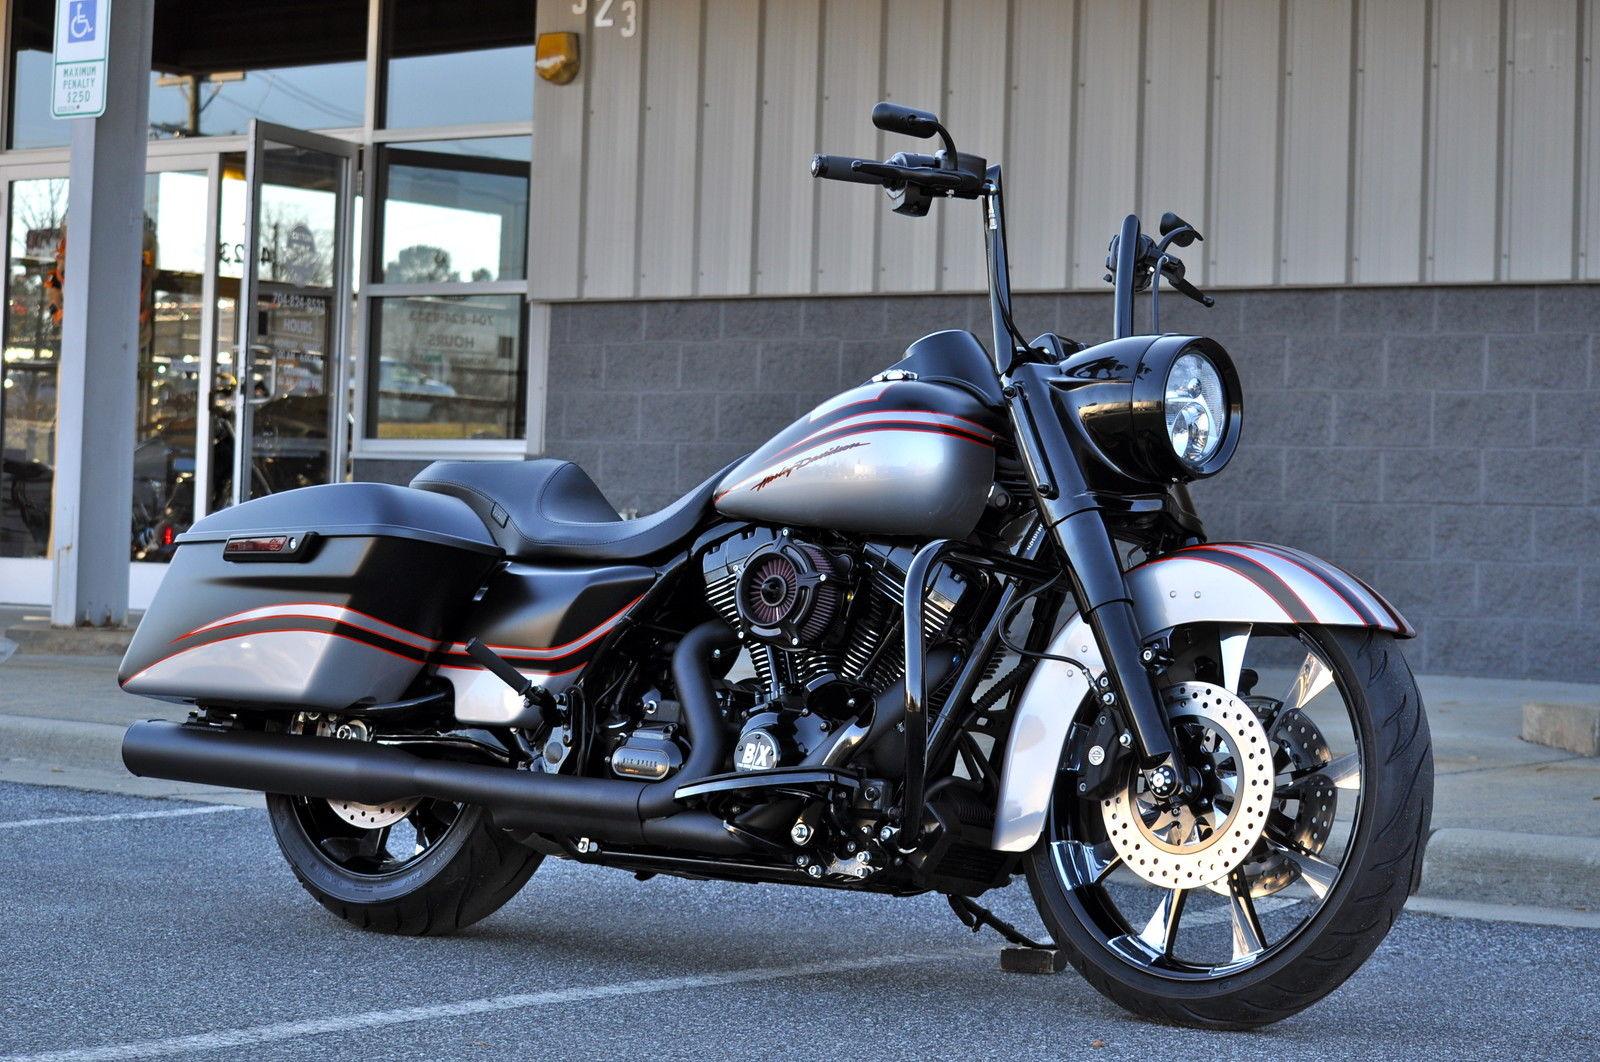 Harley Davidson: 2015 ROAD KING CUSTOM A.B.S. **MINT** $15,000.00 IN XTRA'S